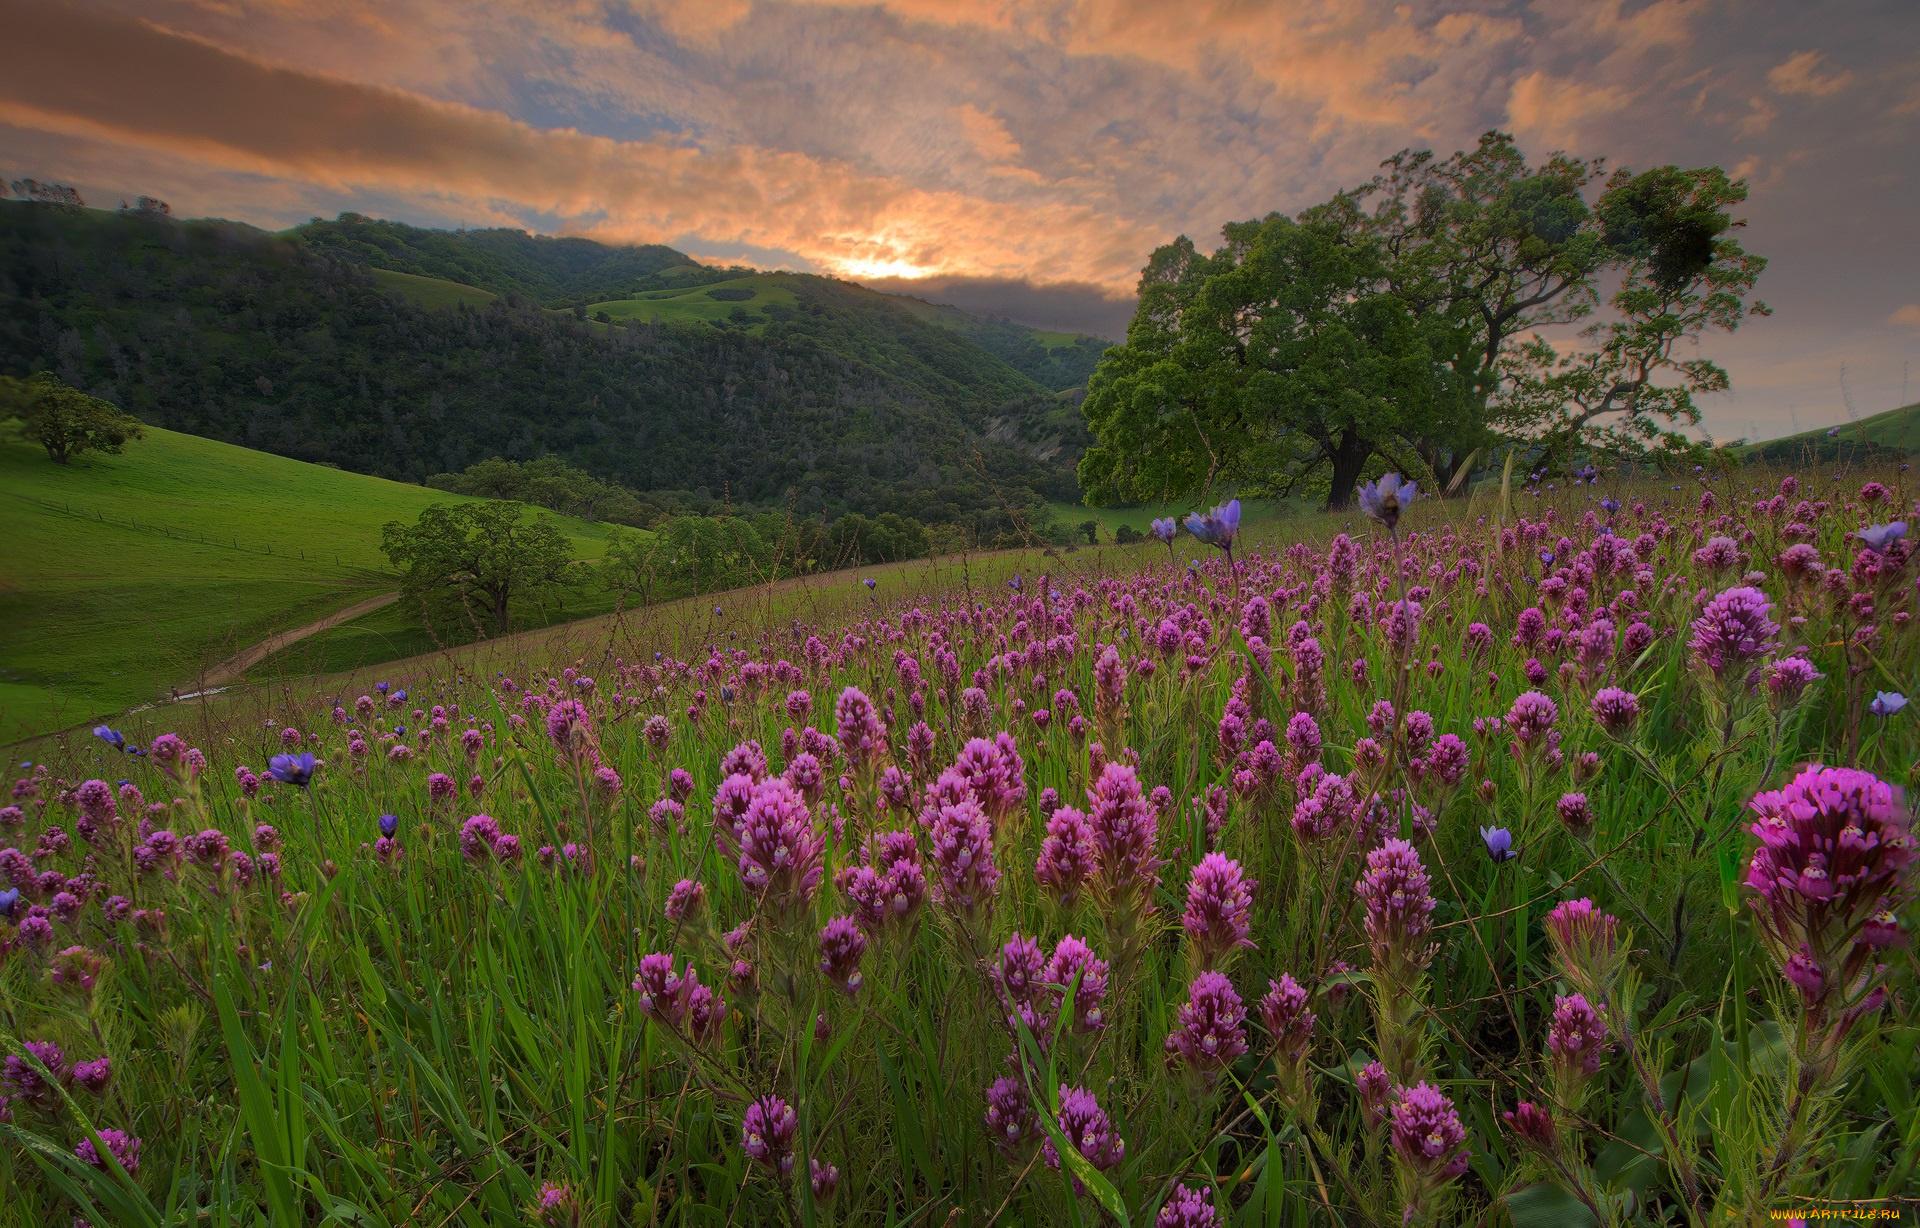 поляна цветы трава холмы горы glade flowers grass hills mountains  № 1829282 бесплатно